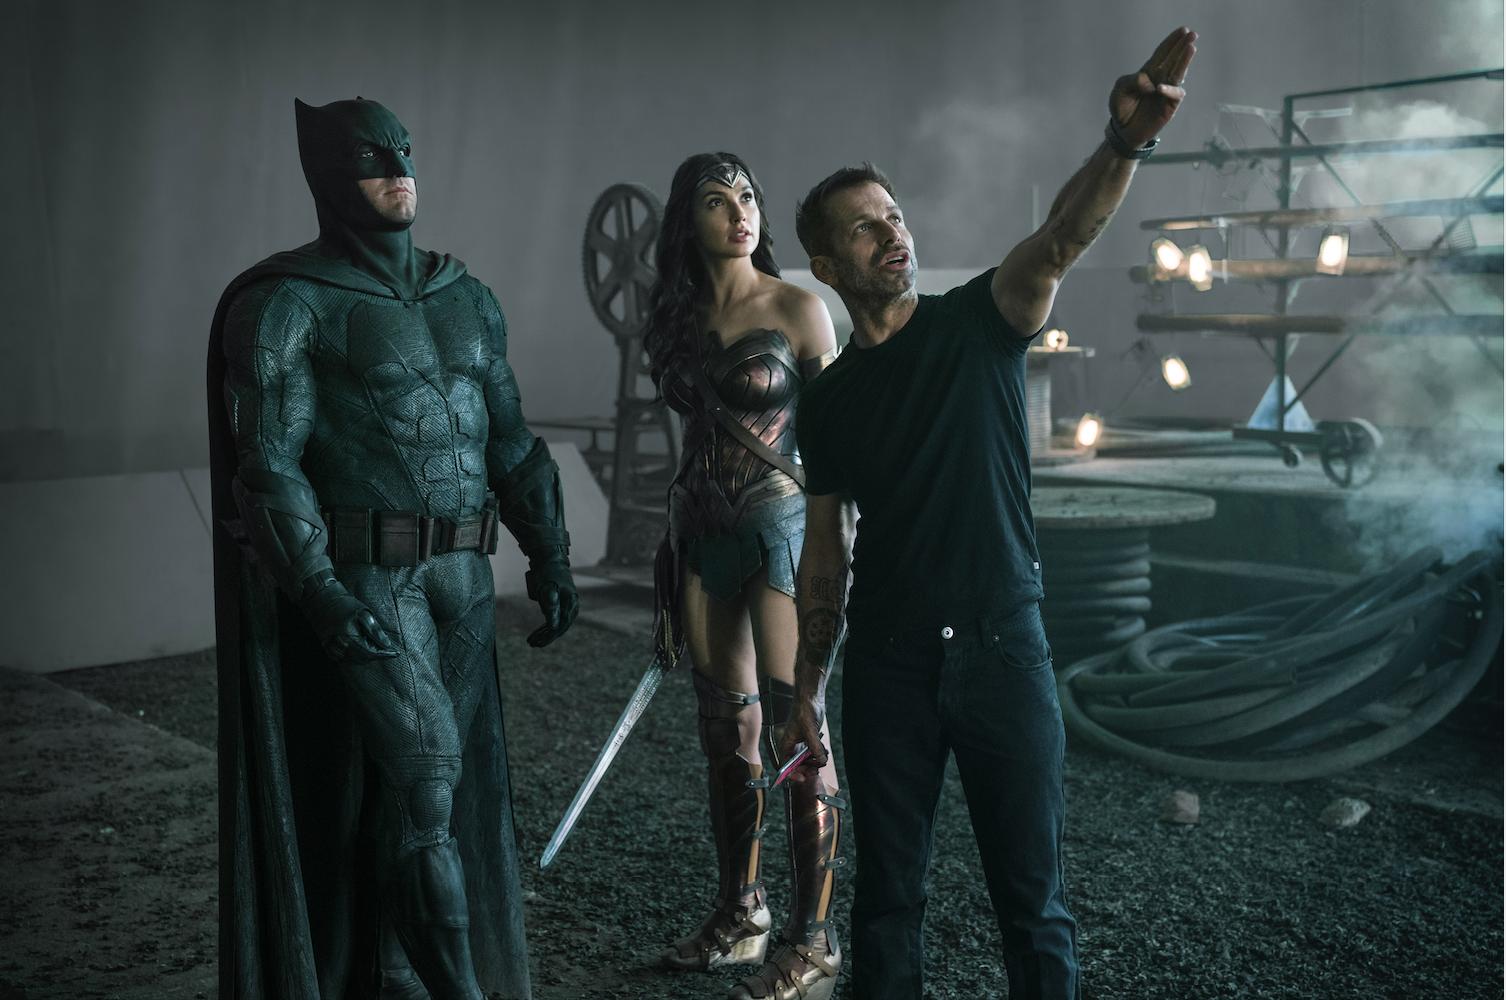 Zack directing Ben Affleck, who plays Batman, and Gal Gadot, who plays Wonder Woman, on set